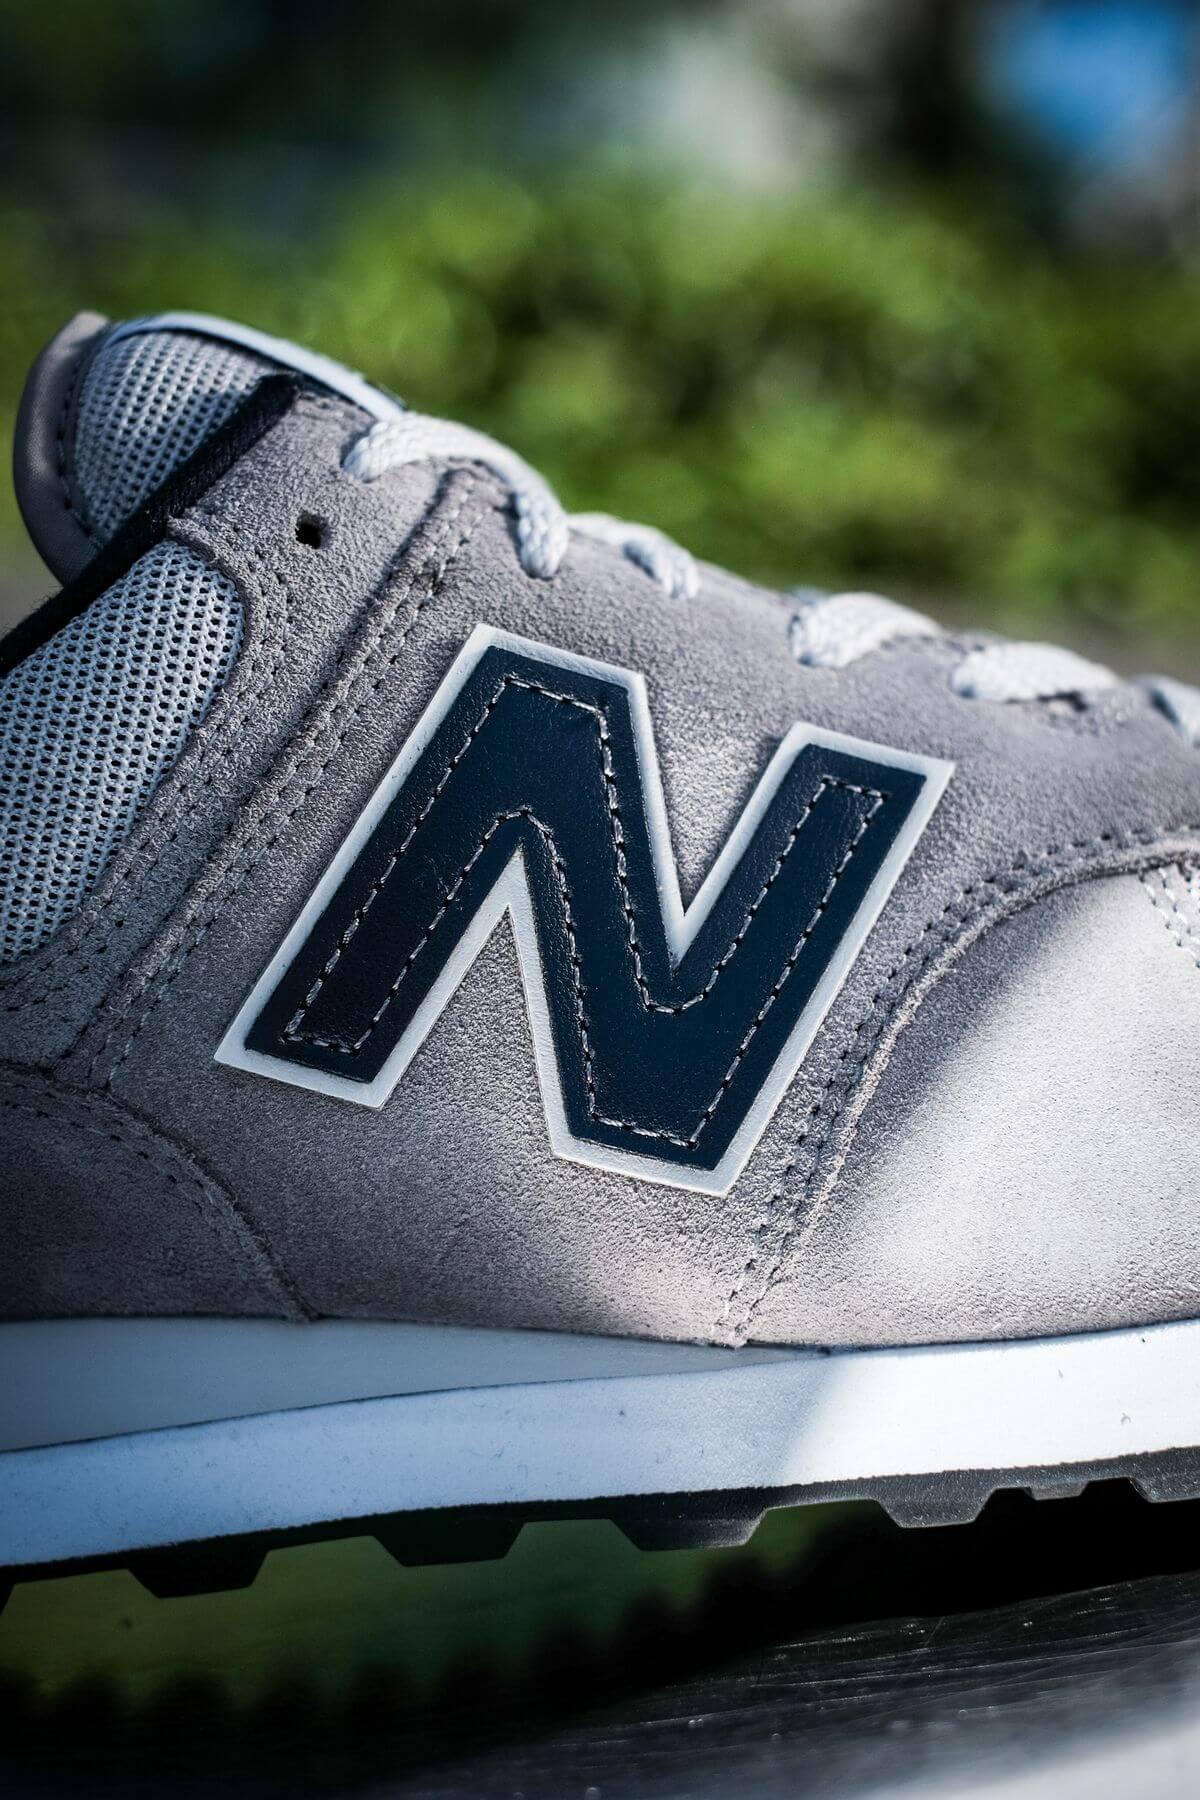 details N branding - New Balance - 574 History Class Pack - ML574BE2 - grey/navy